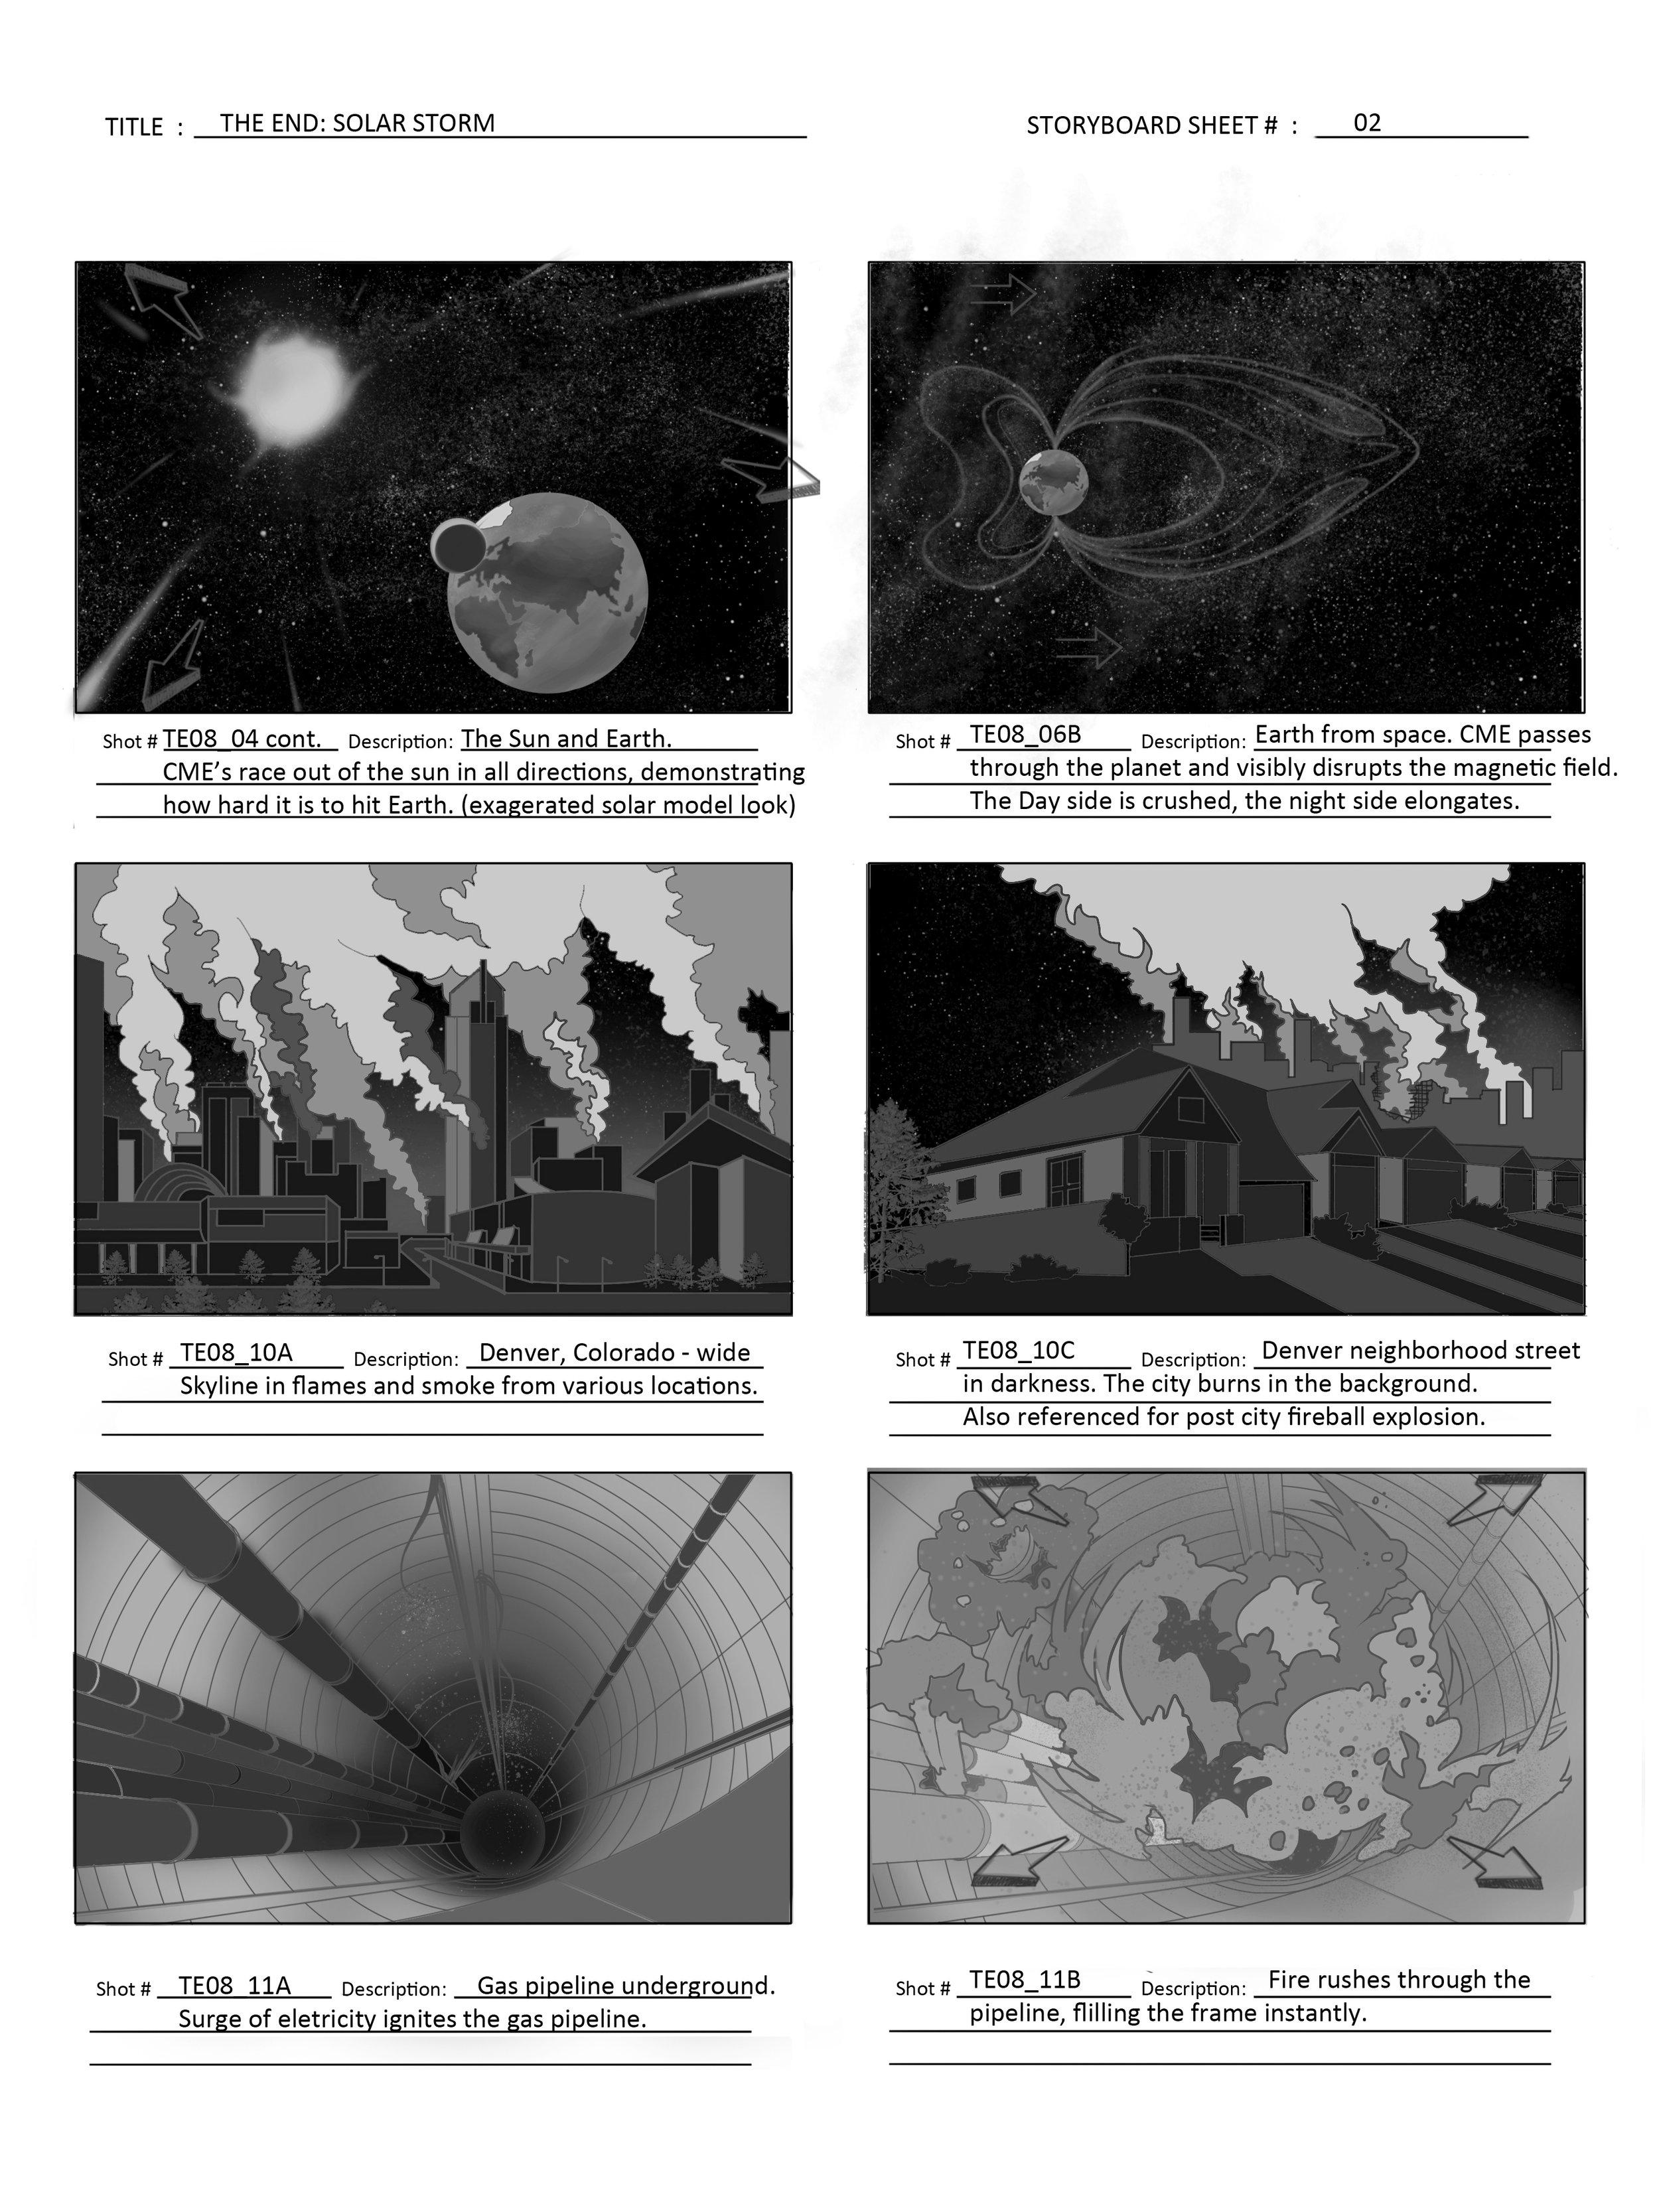 TE08_Solar Storm Storyboard_Digital Revision_Page 02.jpg